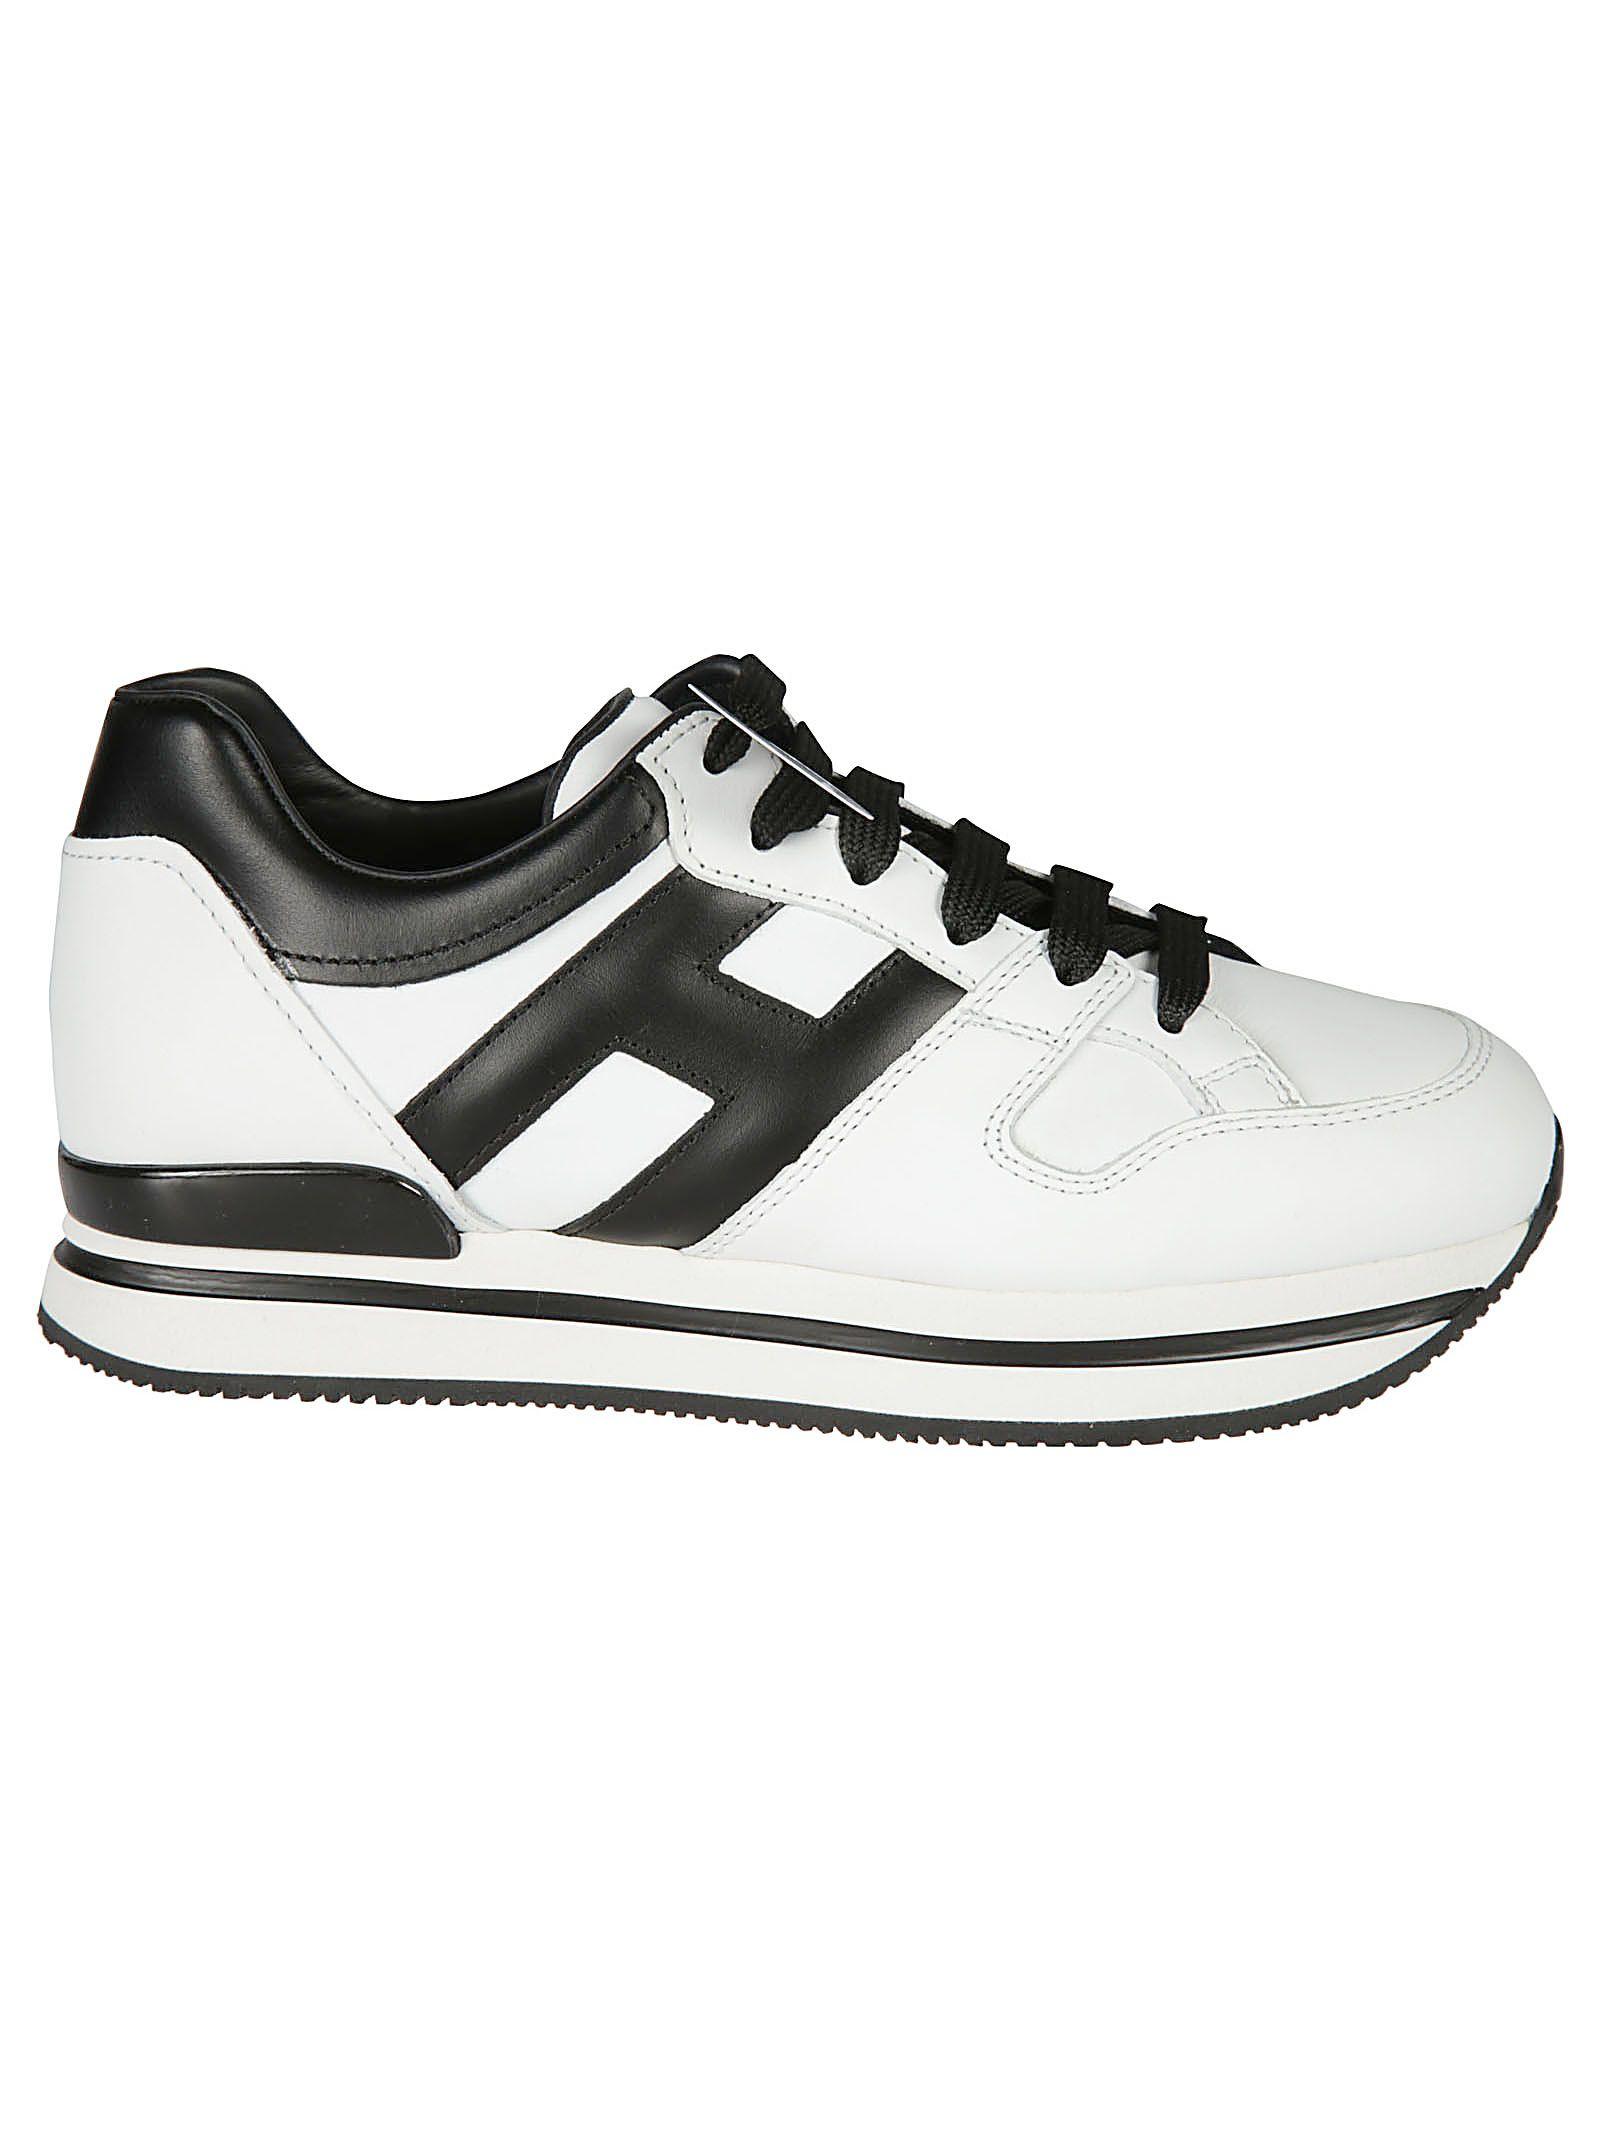 Shop Hogan H222 Sneakers In Bianco/Nero